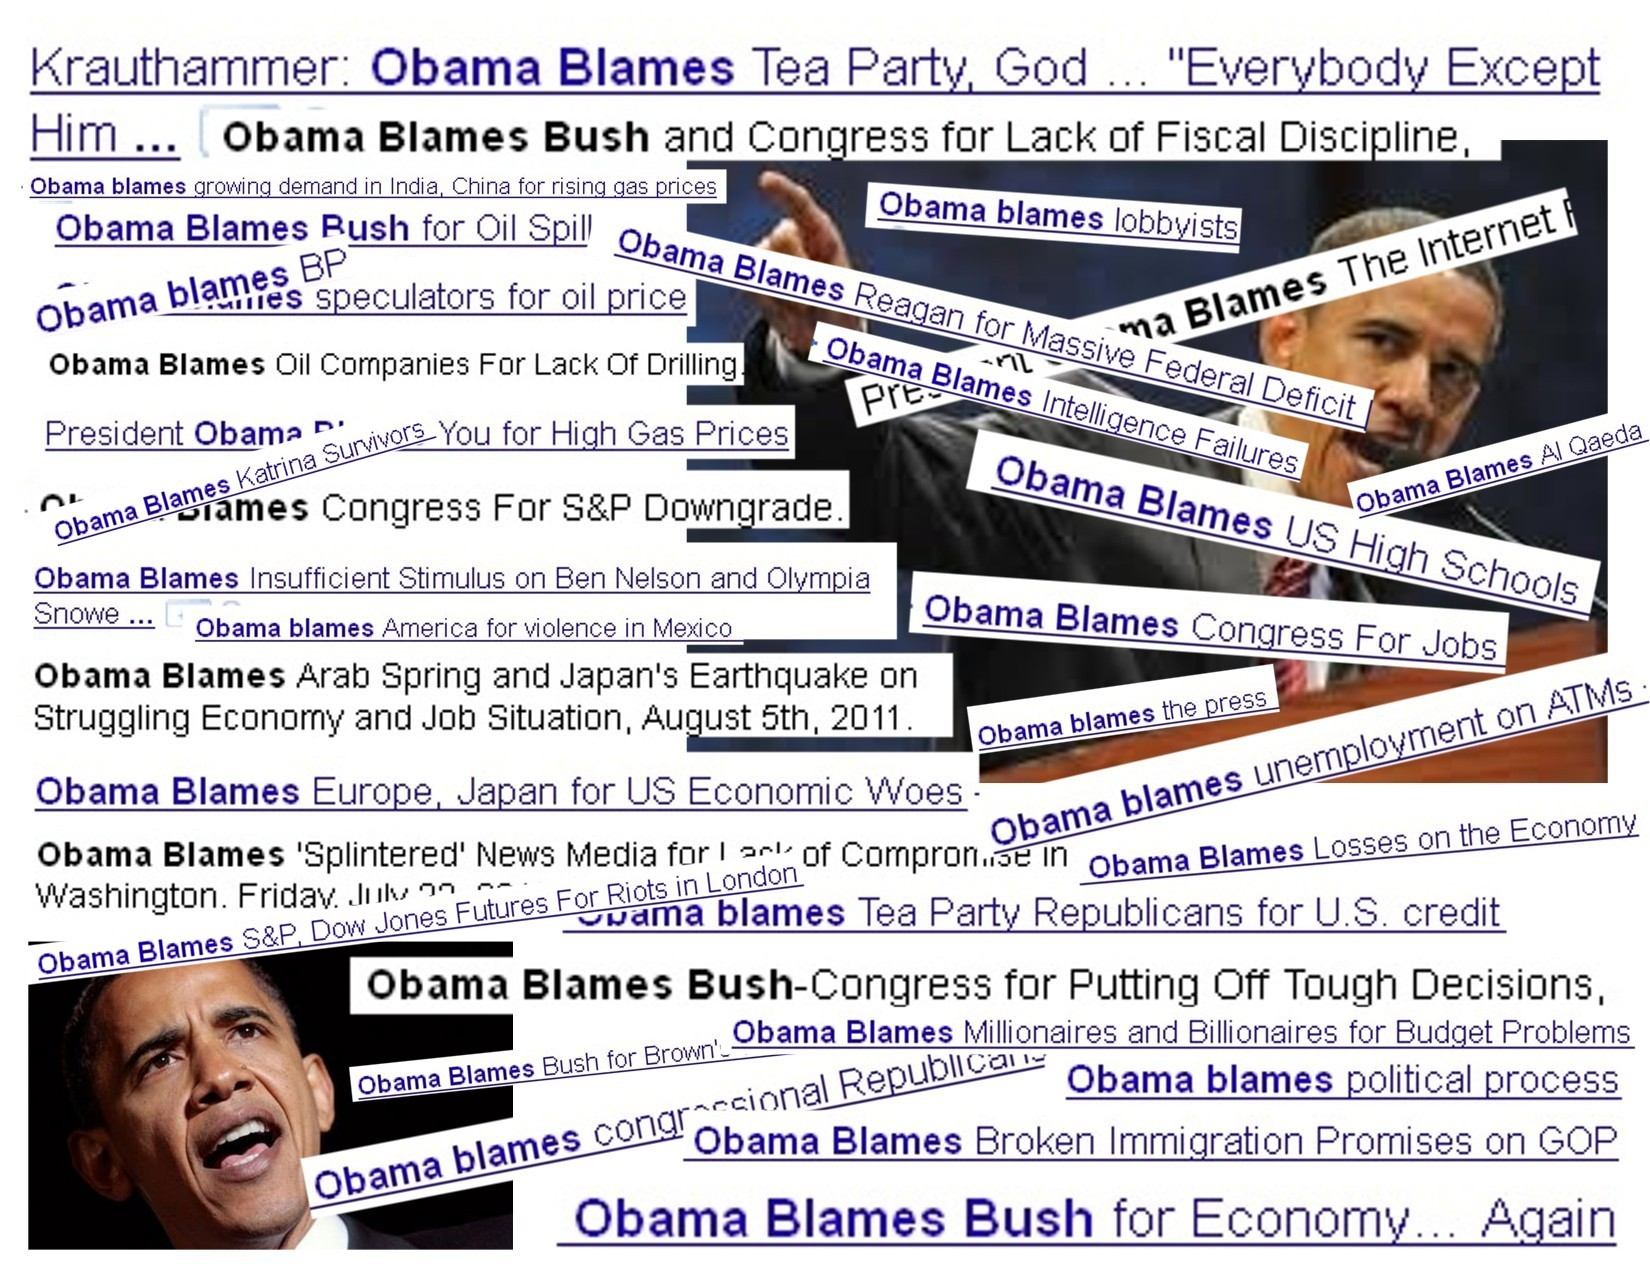 Obama blames... everyone else